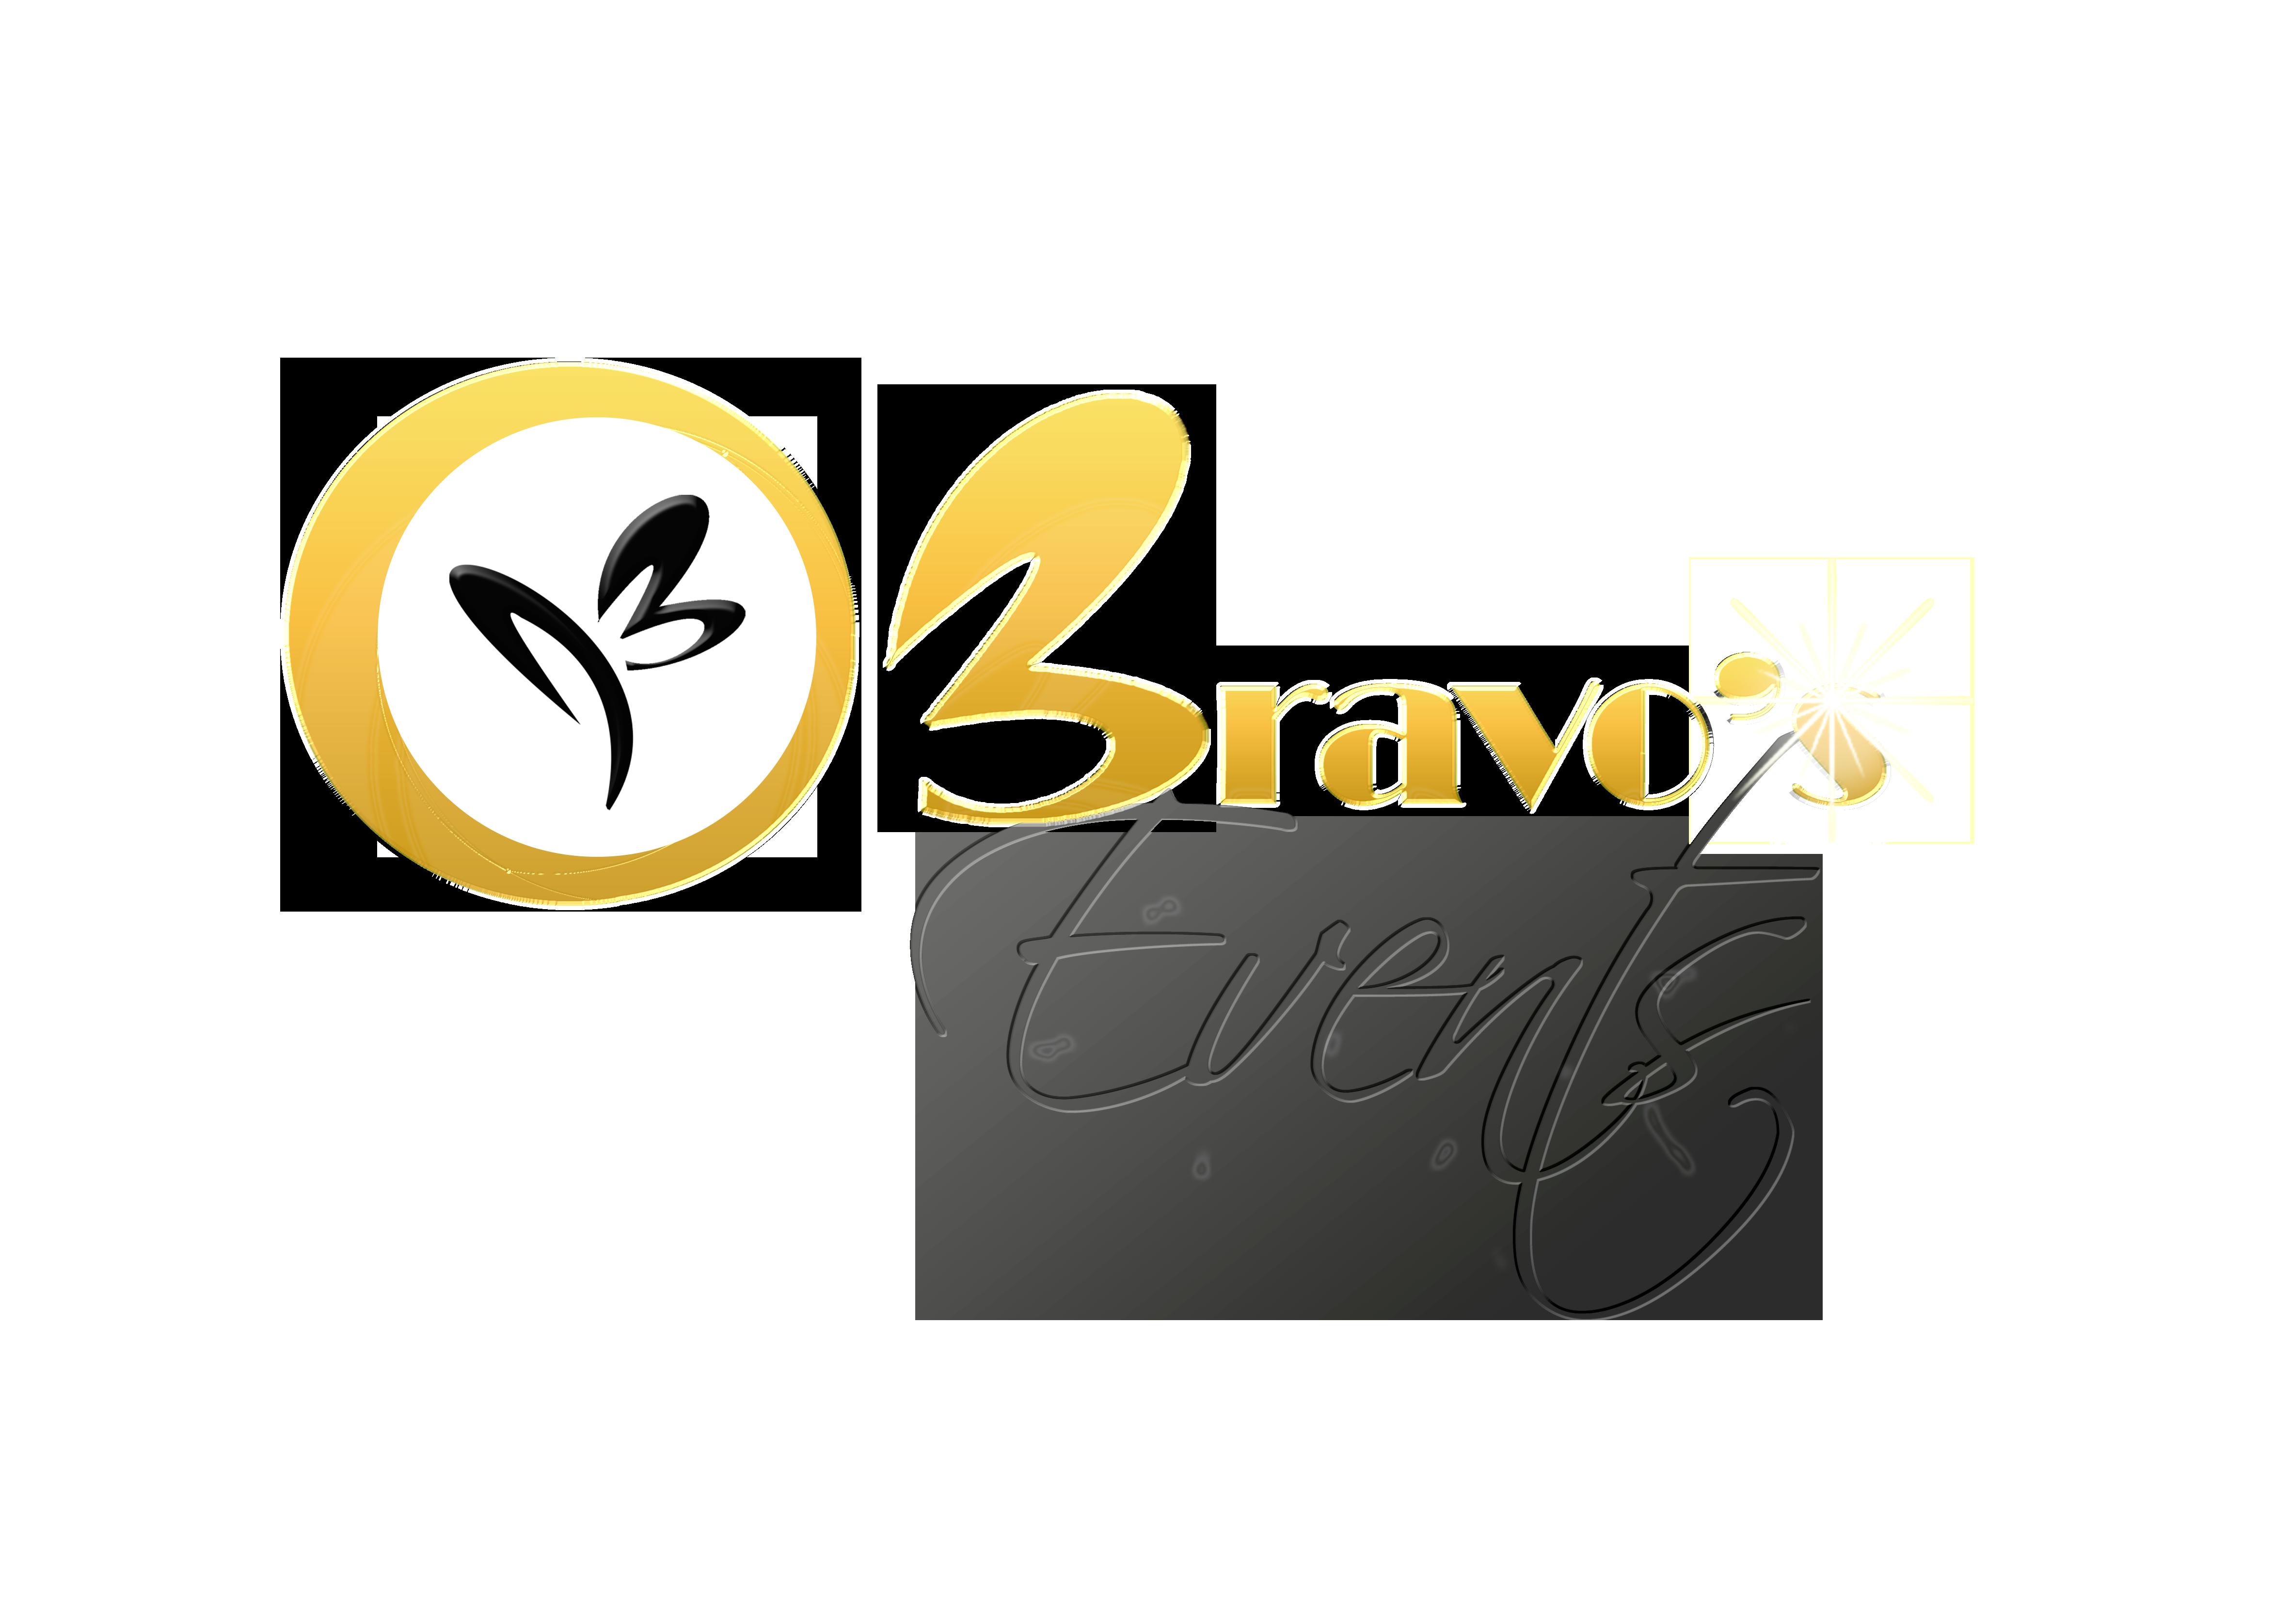 Bravo's Event - New Logo!